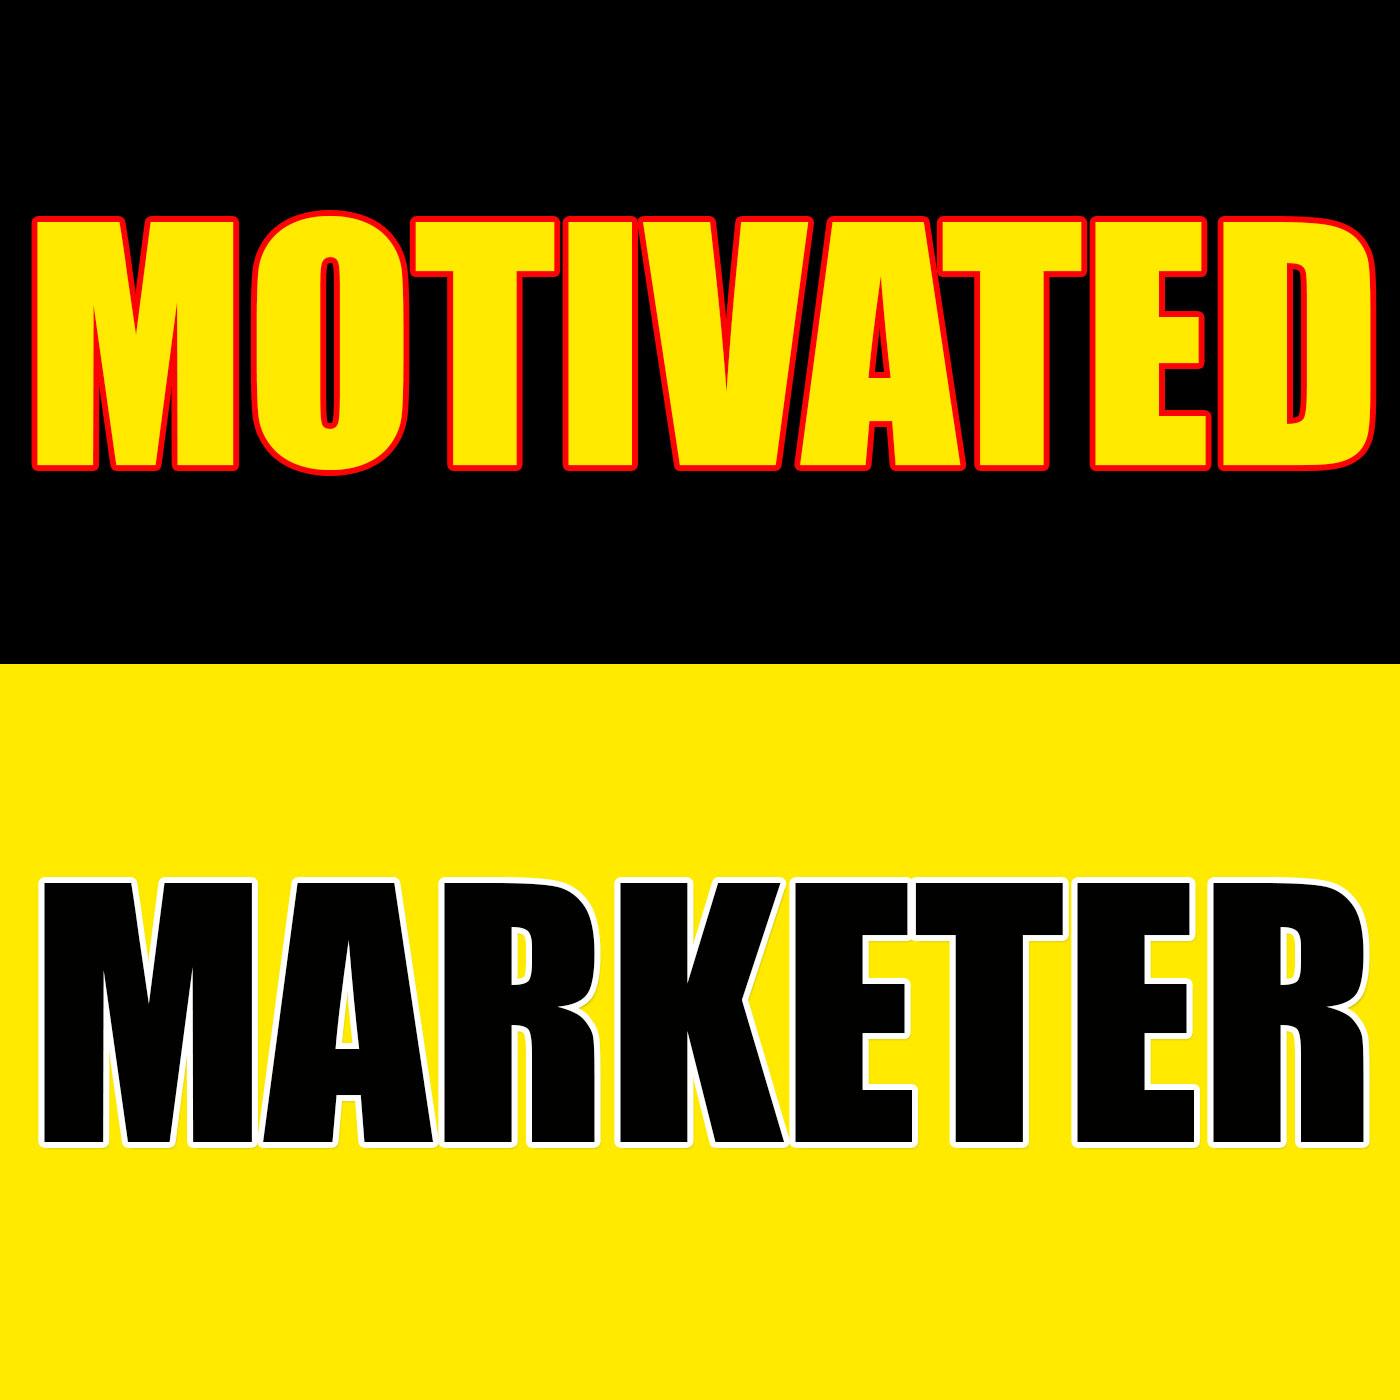 Motivated Marketer | Internet Marketing Mixed with Motivation for Inspiring Entrepreneurs!